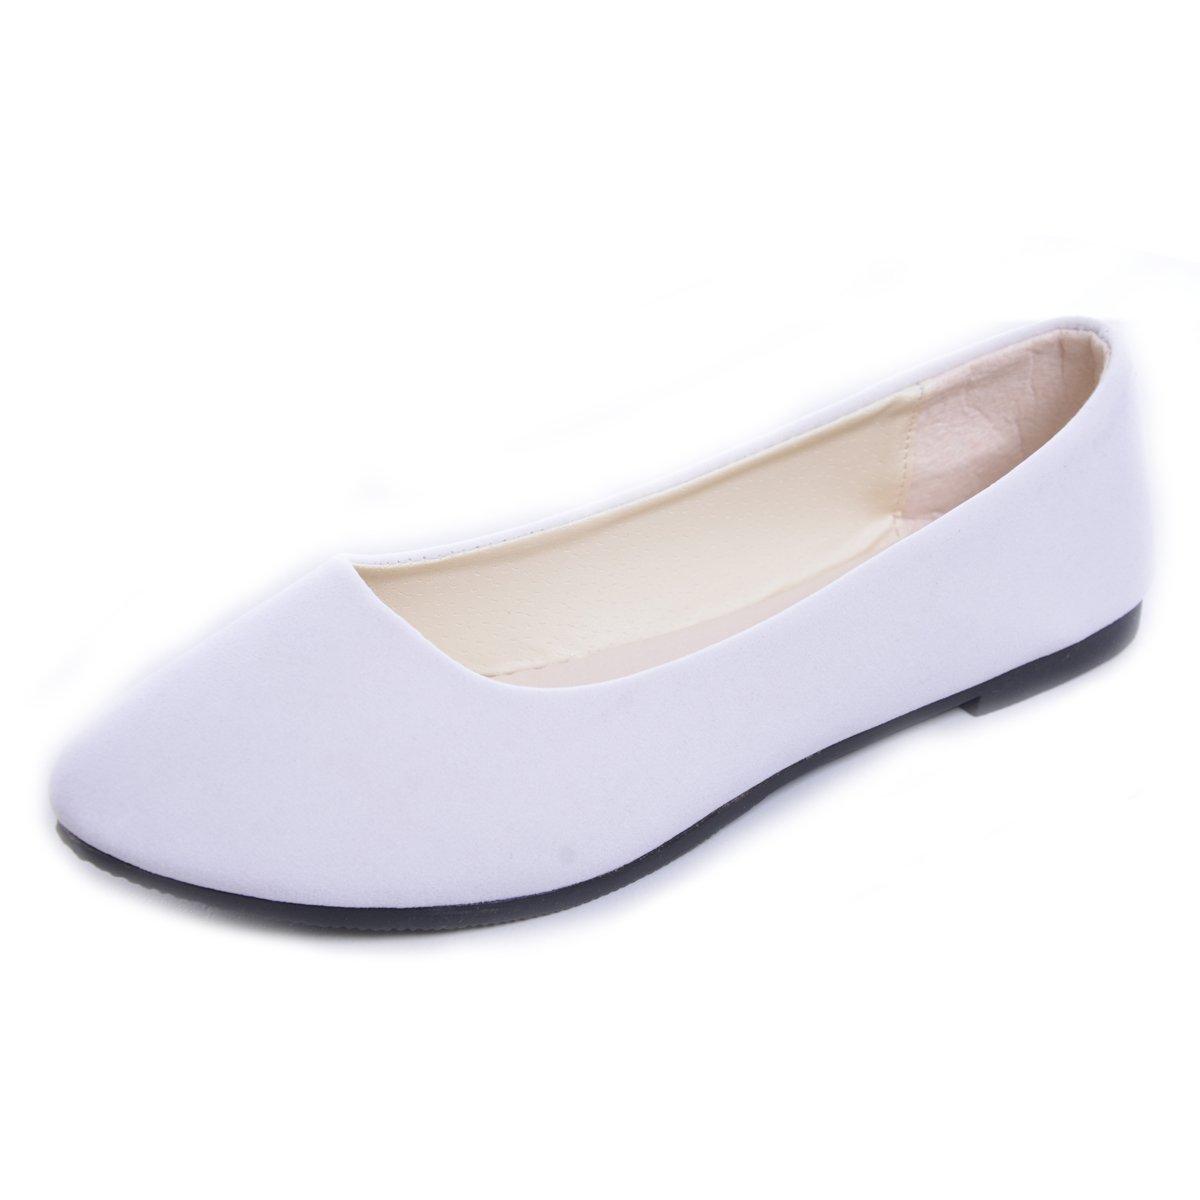 DeerYou Pointy Toe Ballet Flats Women Slip On Suede Ballerina Walking Shoes White US 7